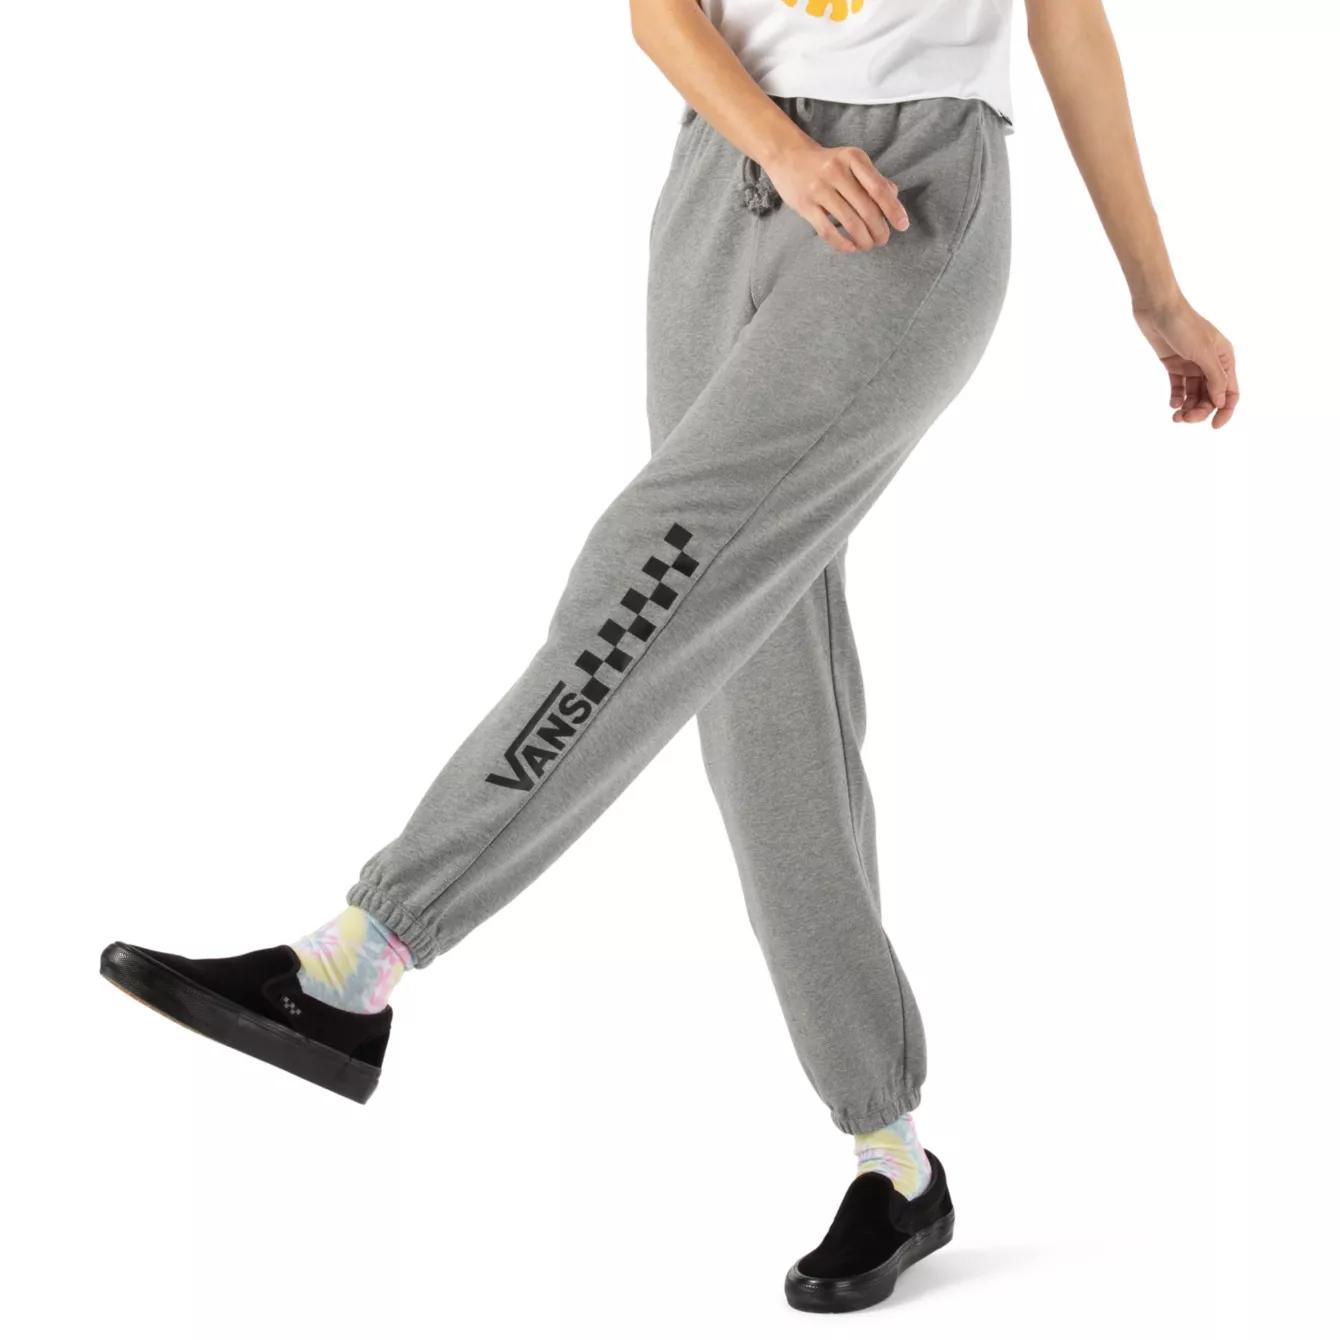 Vans Women's Chalkboard Sweatpant (Multiple Color Options)